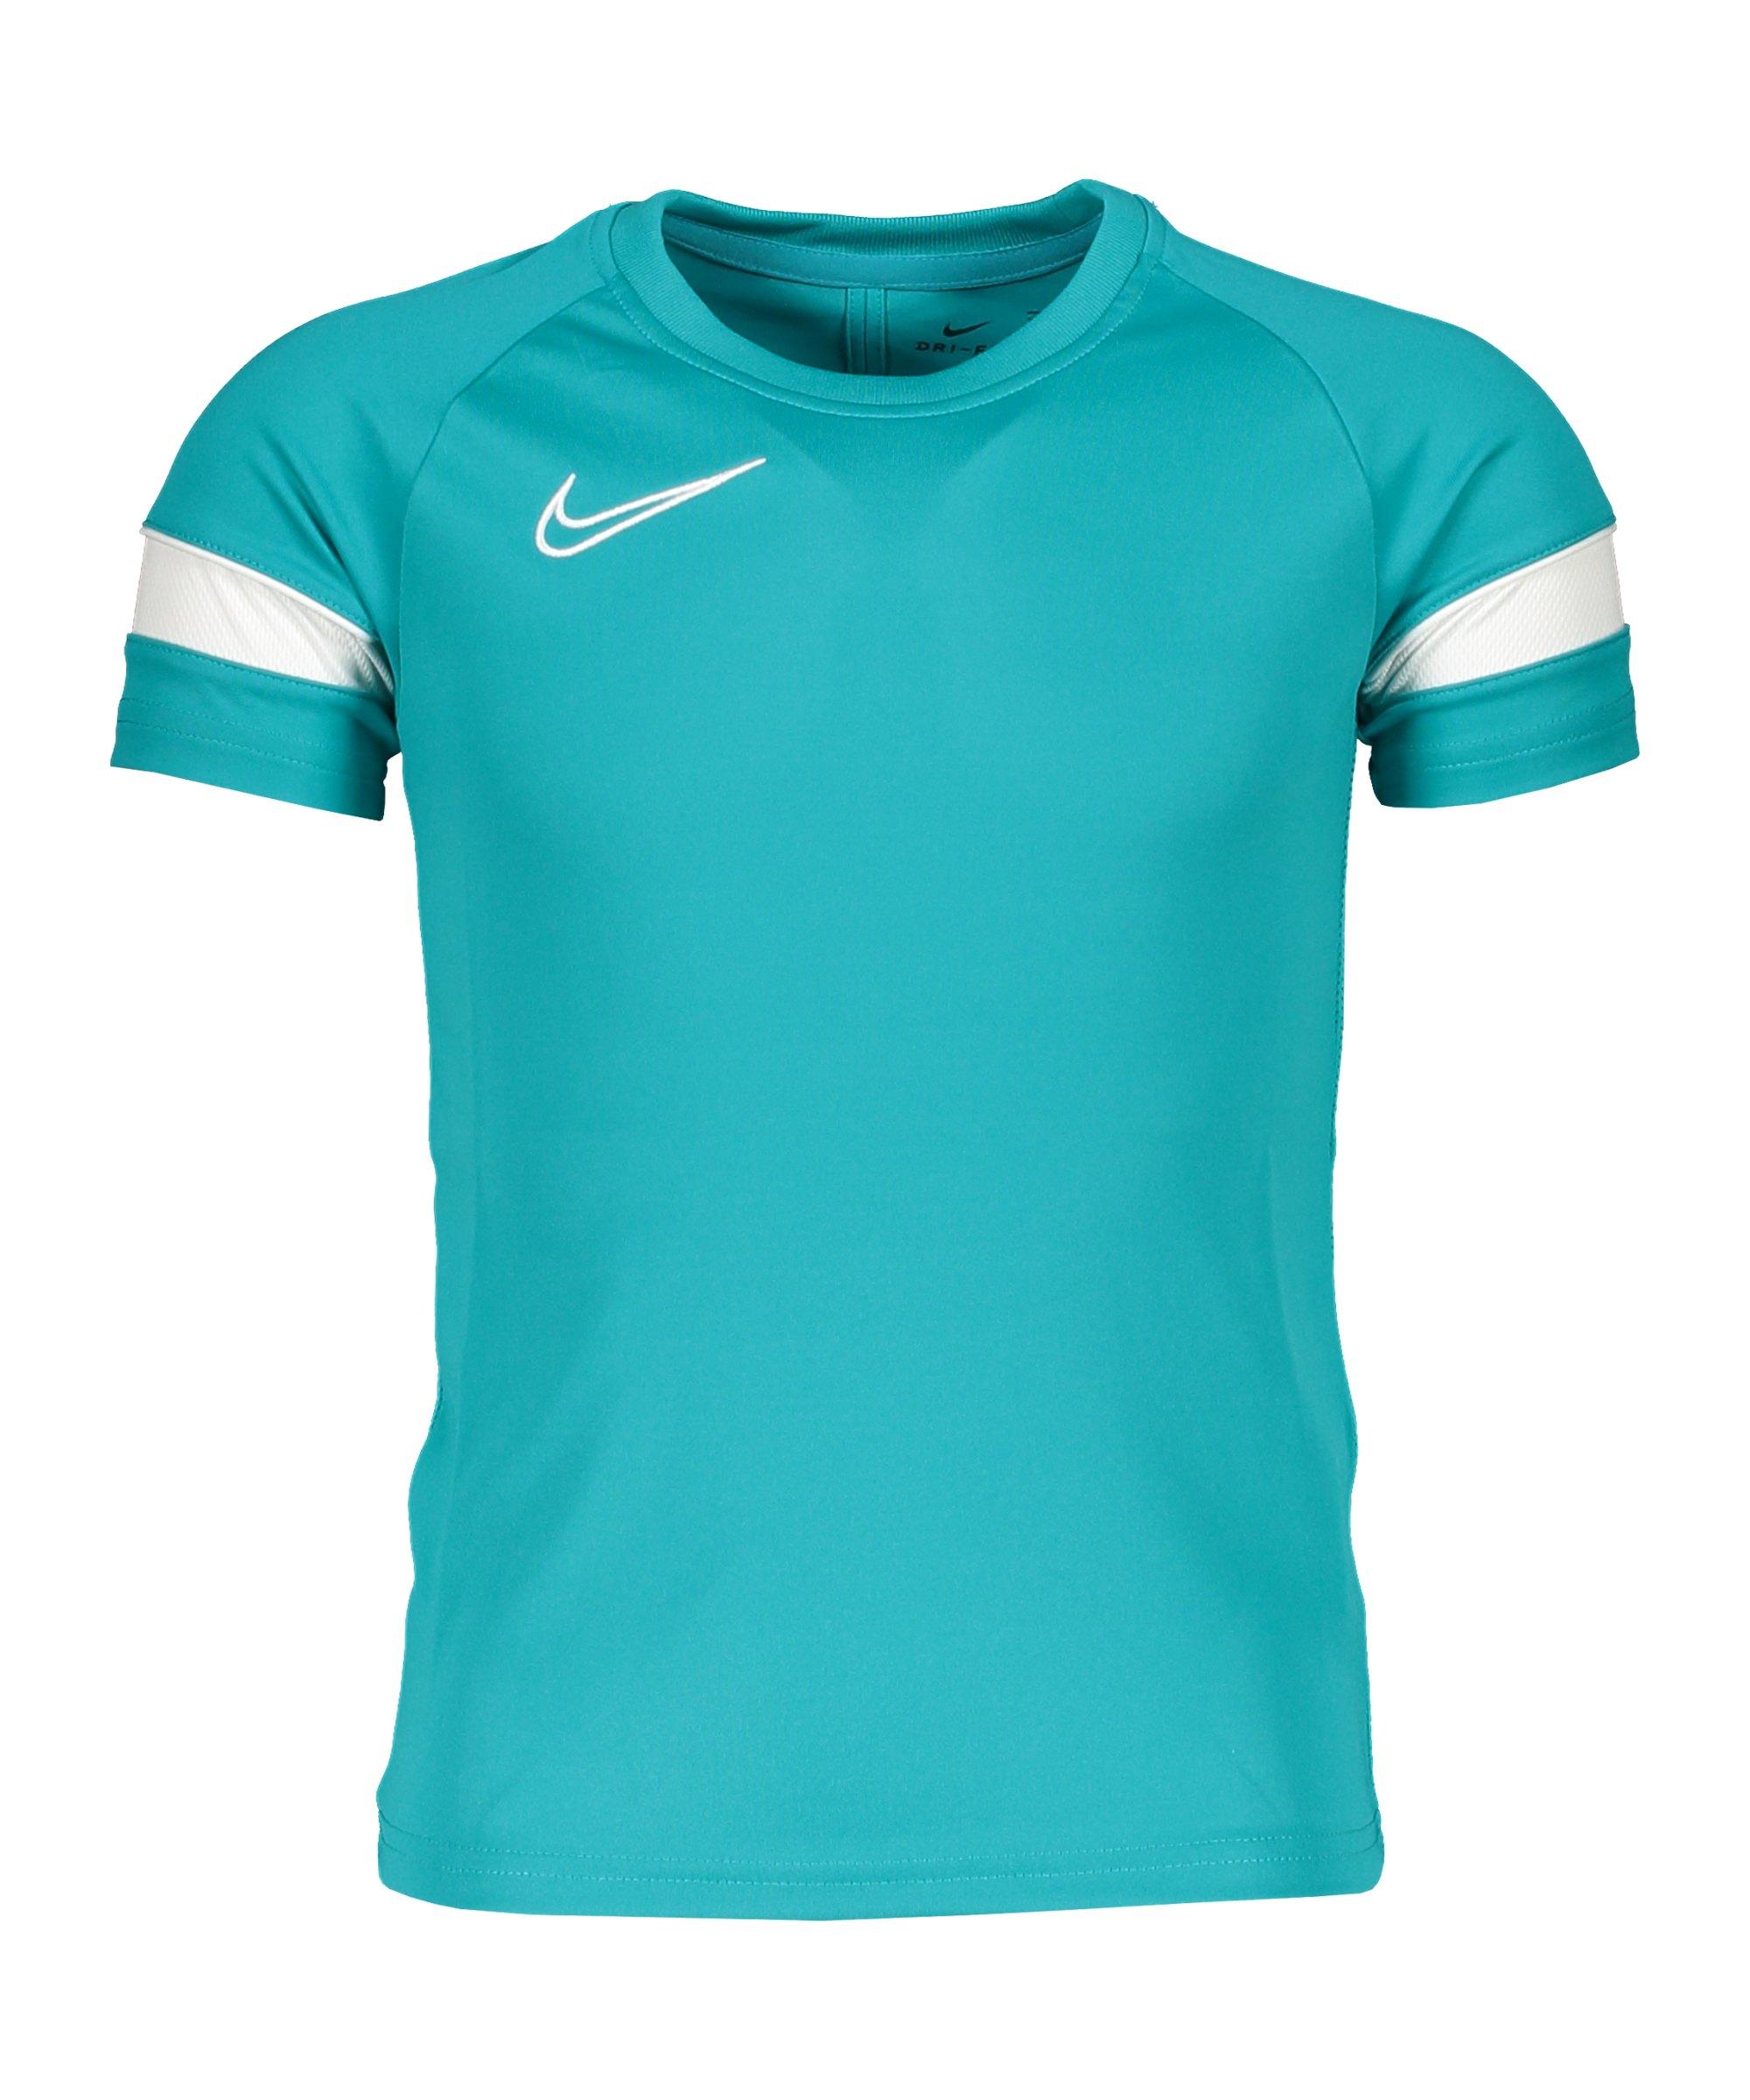 Nike Academy 21 T-Shirt Kids Blau Weiss F356 - tuerkis